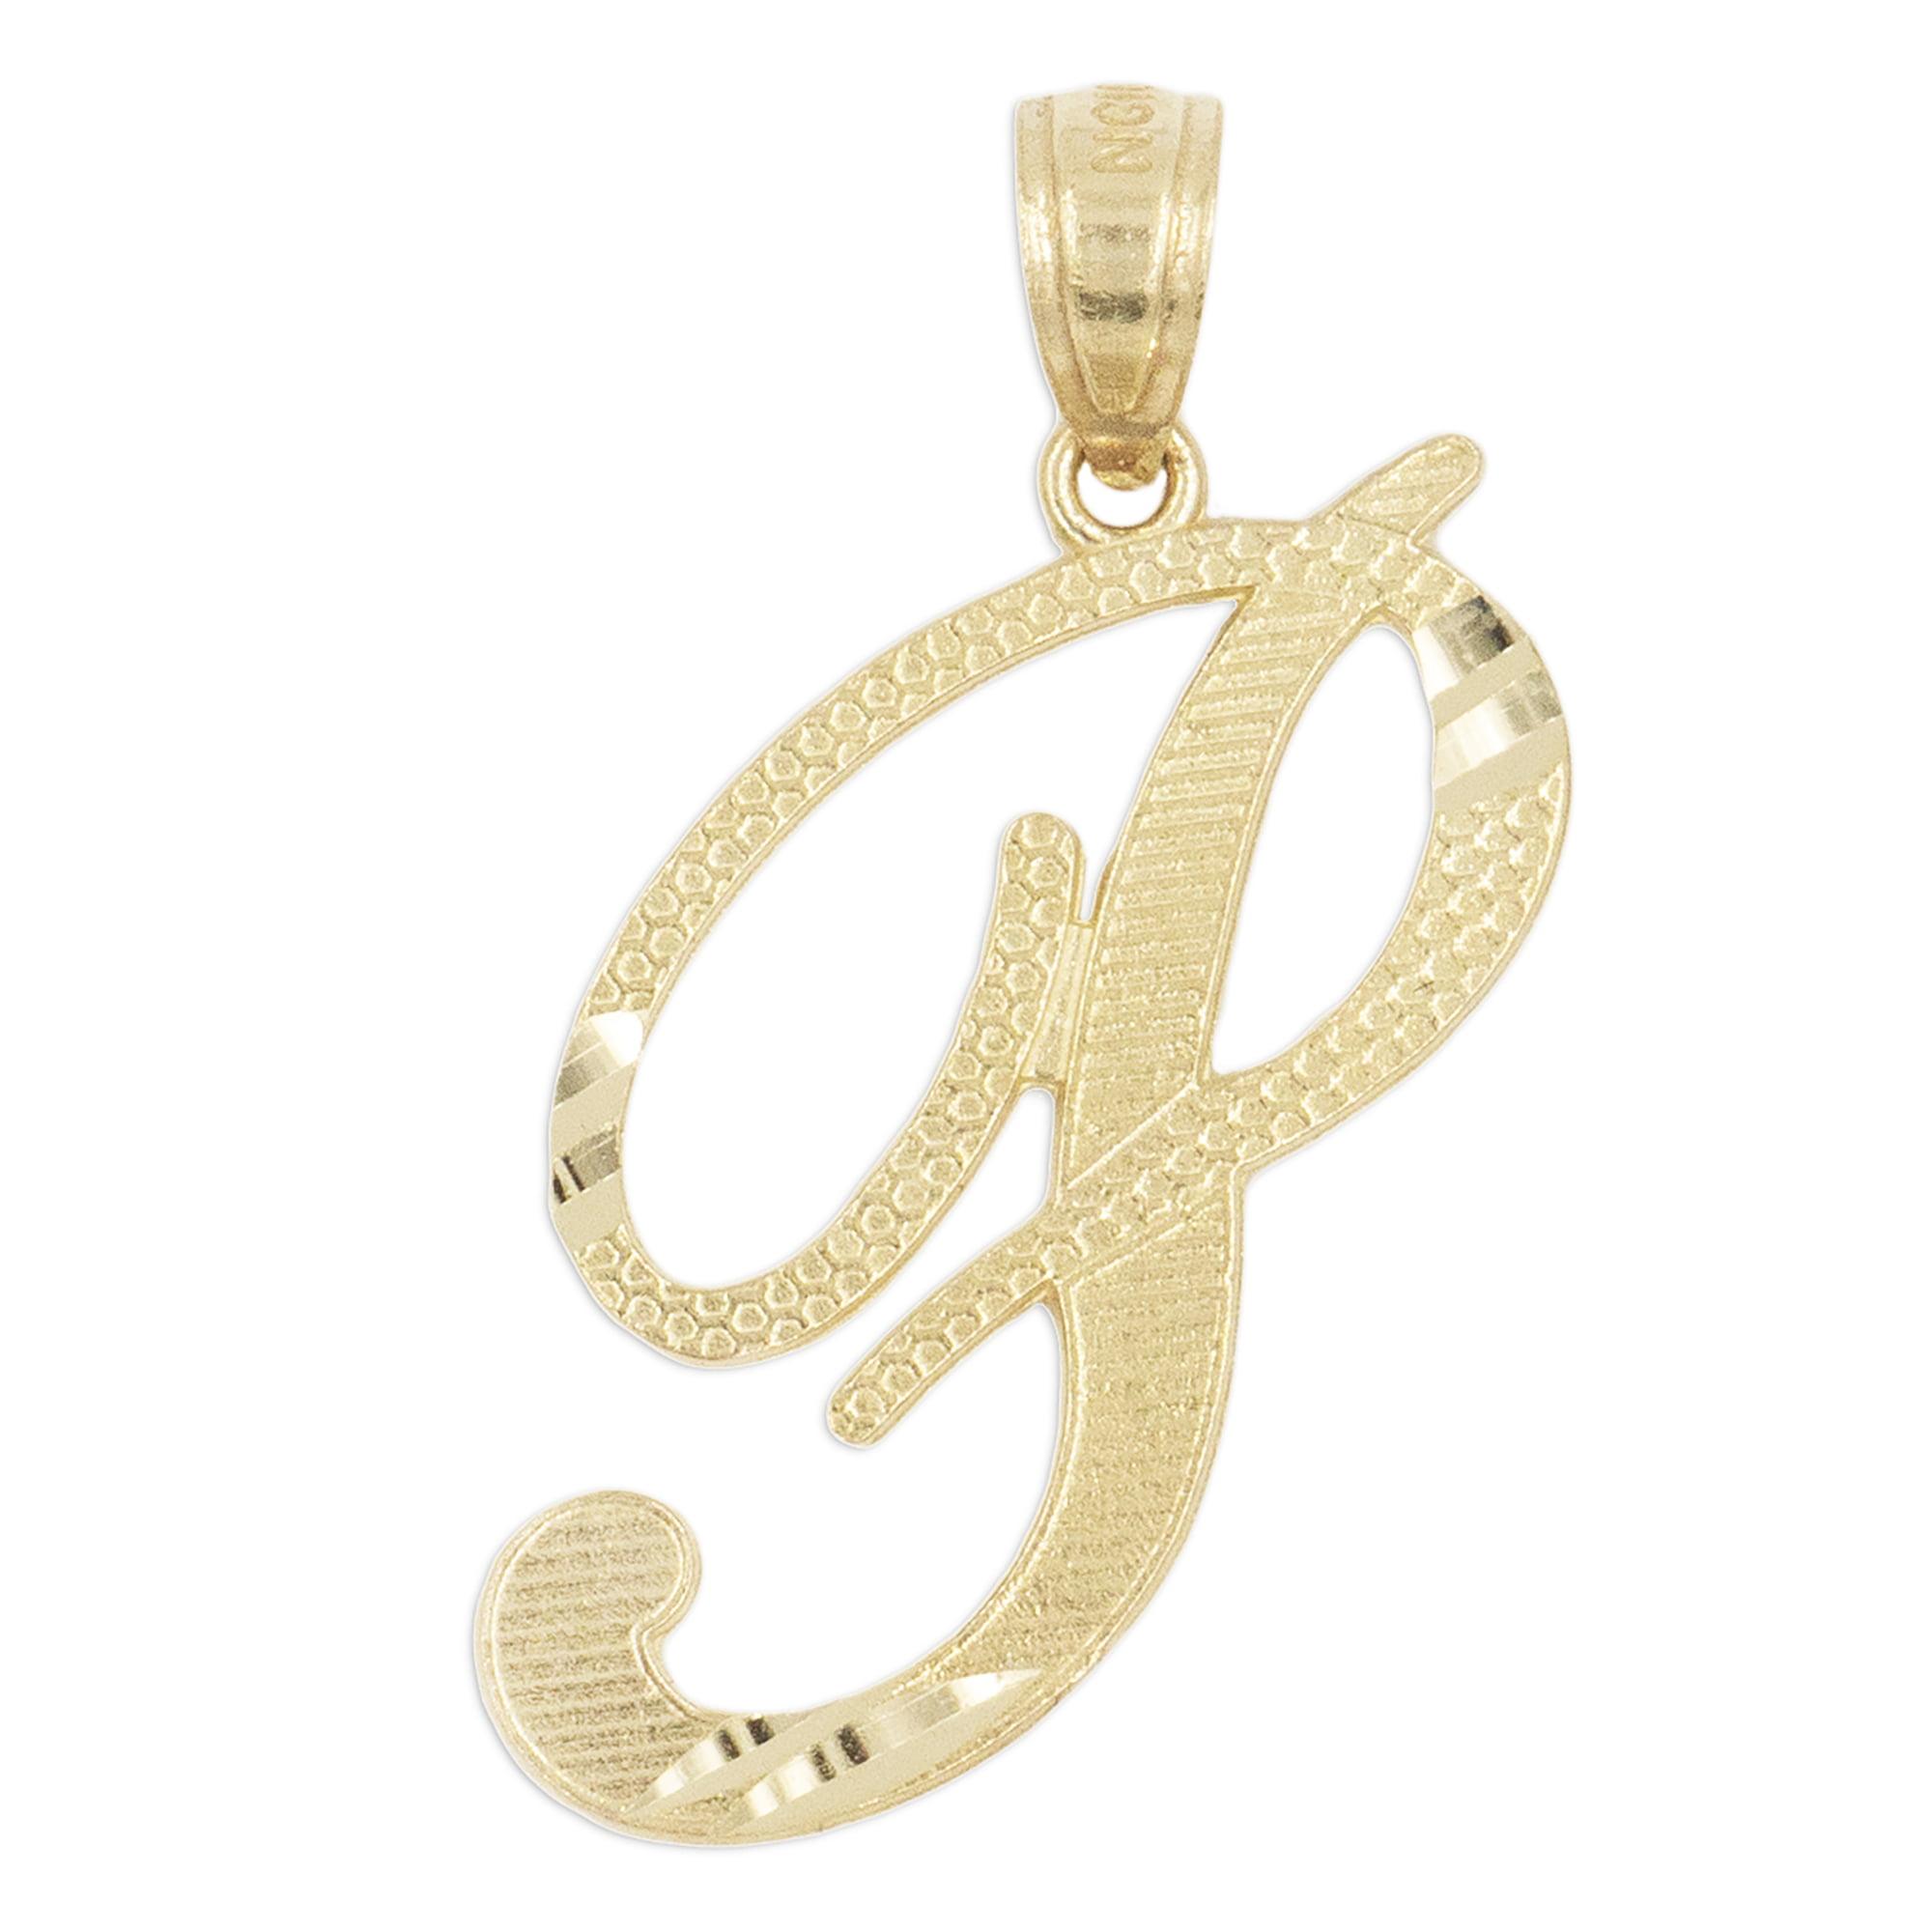 14K Real Yellow Gold Small It/'s A Boy Diamond Cut Charm Pendant Baby /& Children